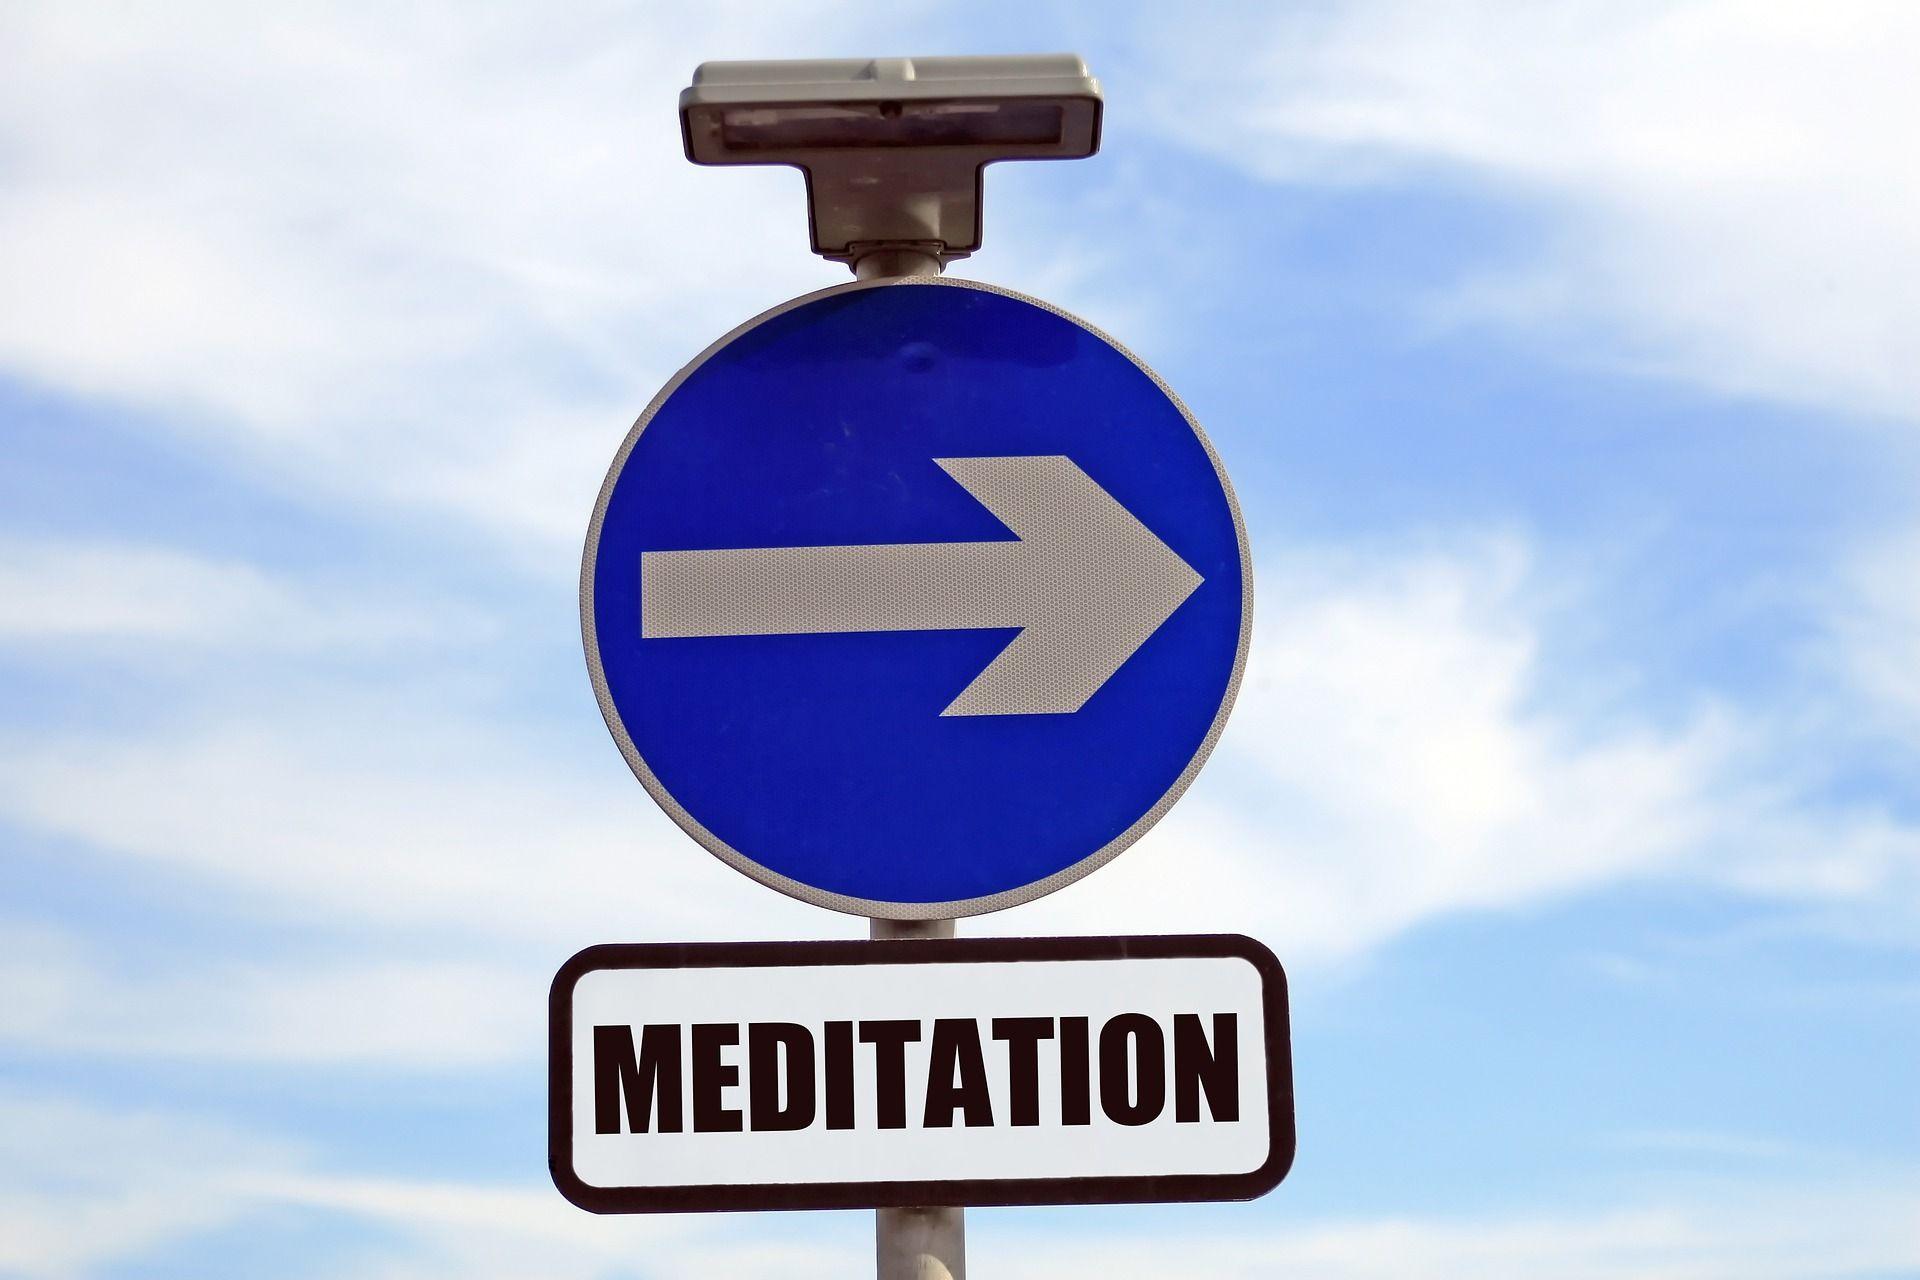 OSHO meditation and facilitation training